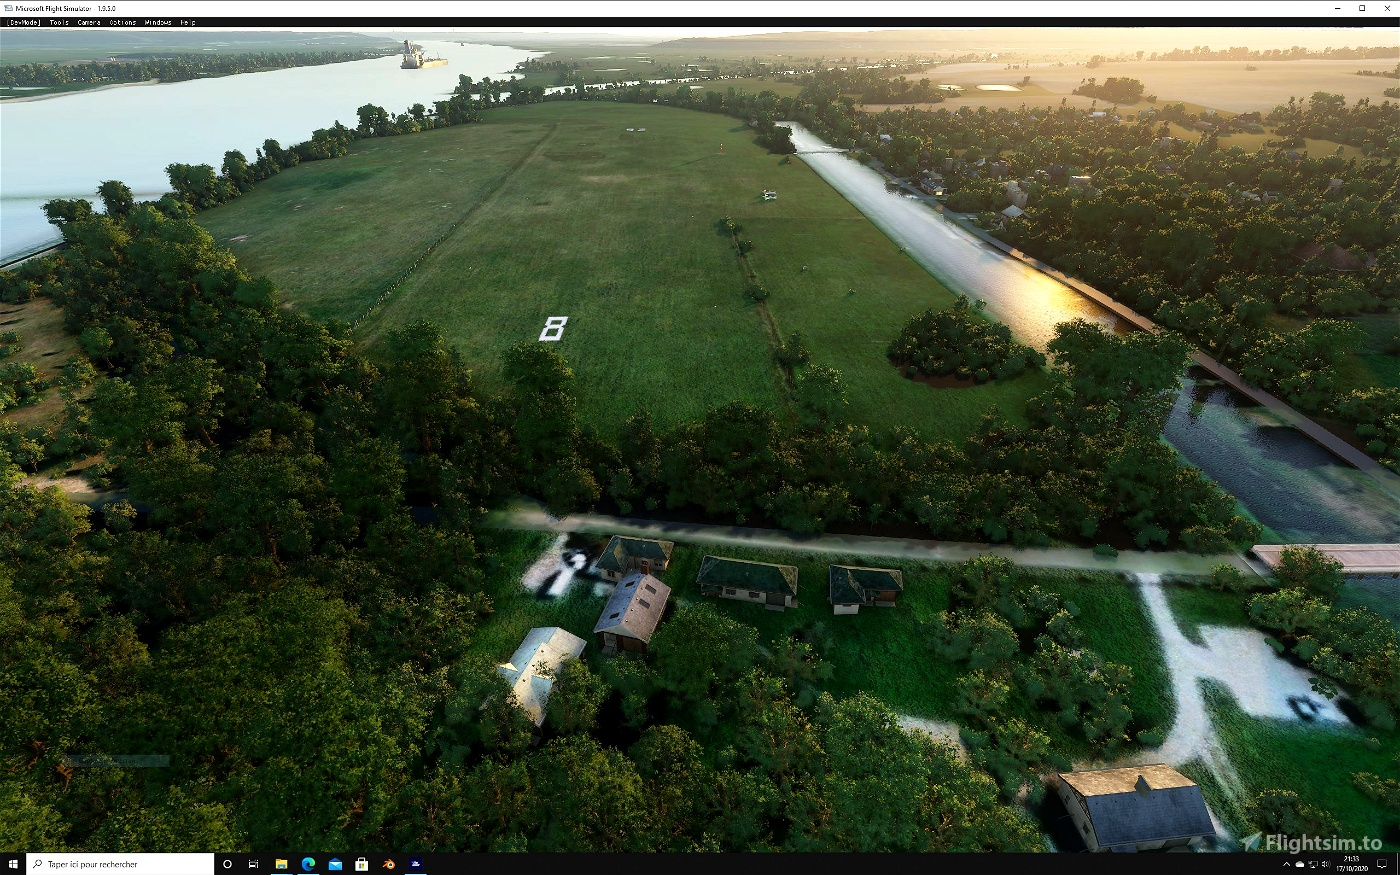 LF2722 Base ULM BERVILLE Image Flight Simulator 2020